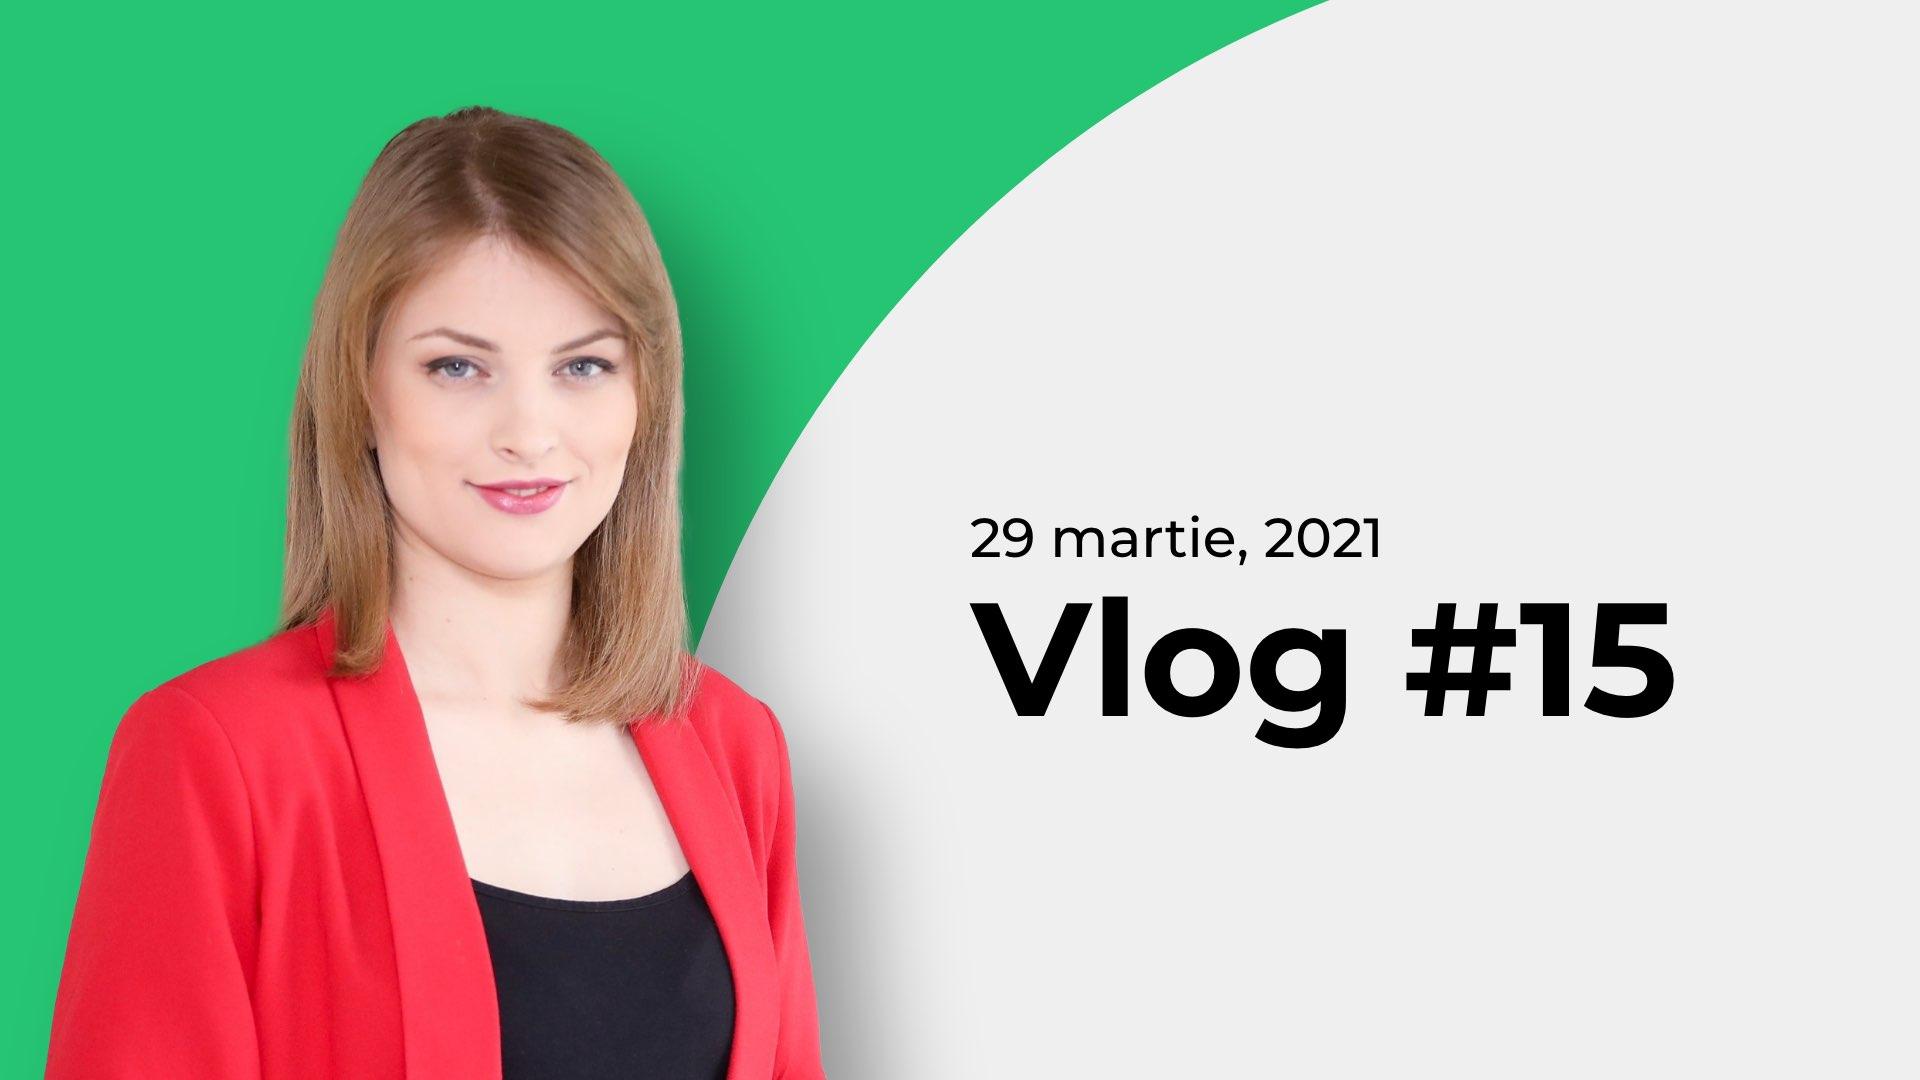 VLOG #15 - Video Newsletter Nature Talks